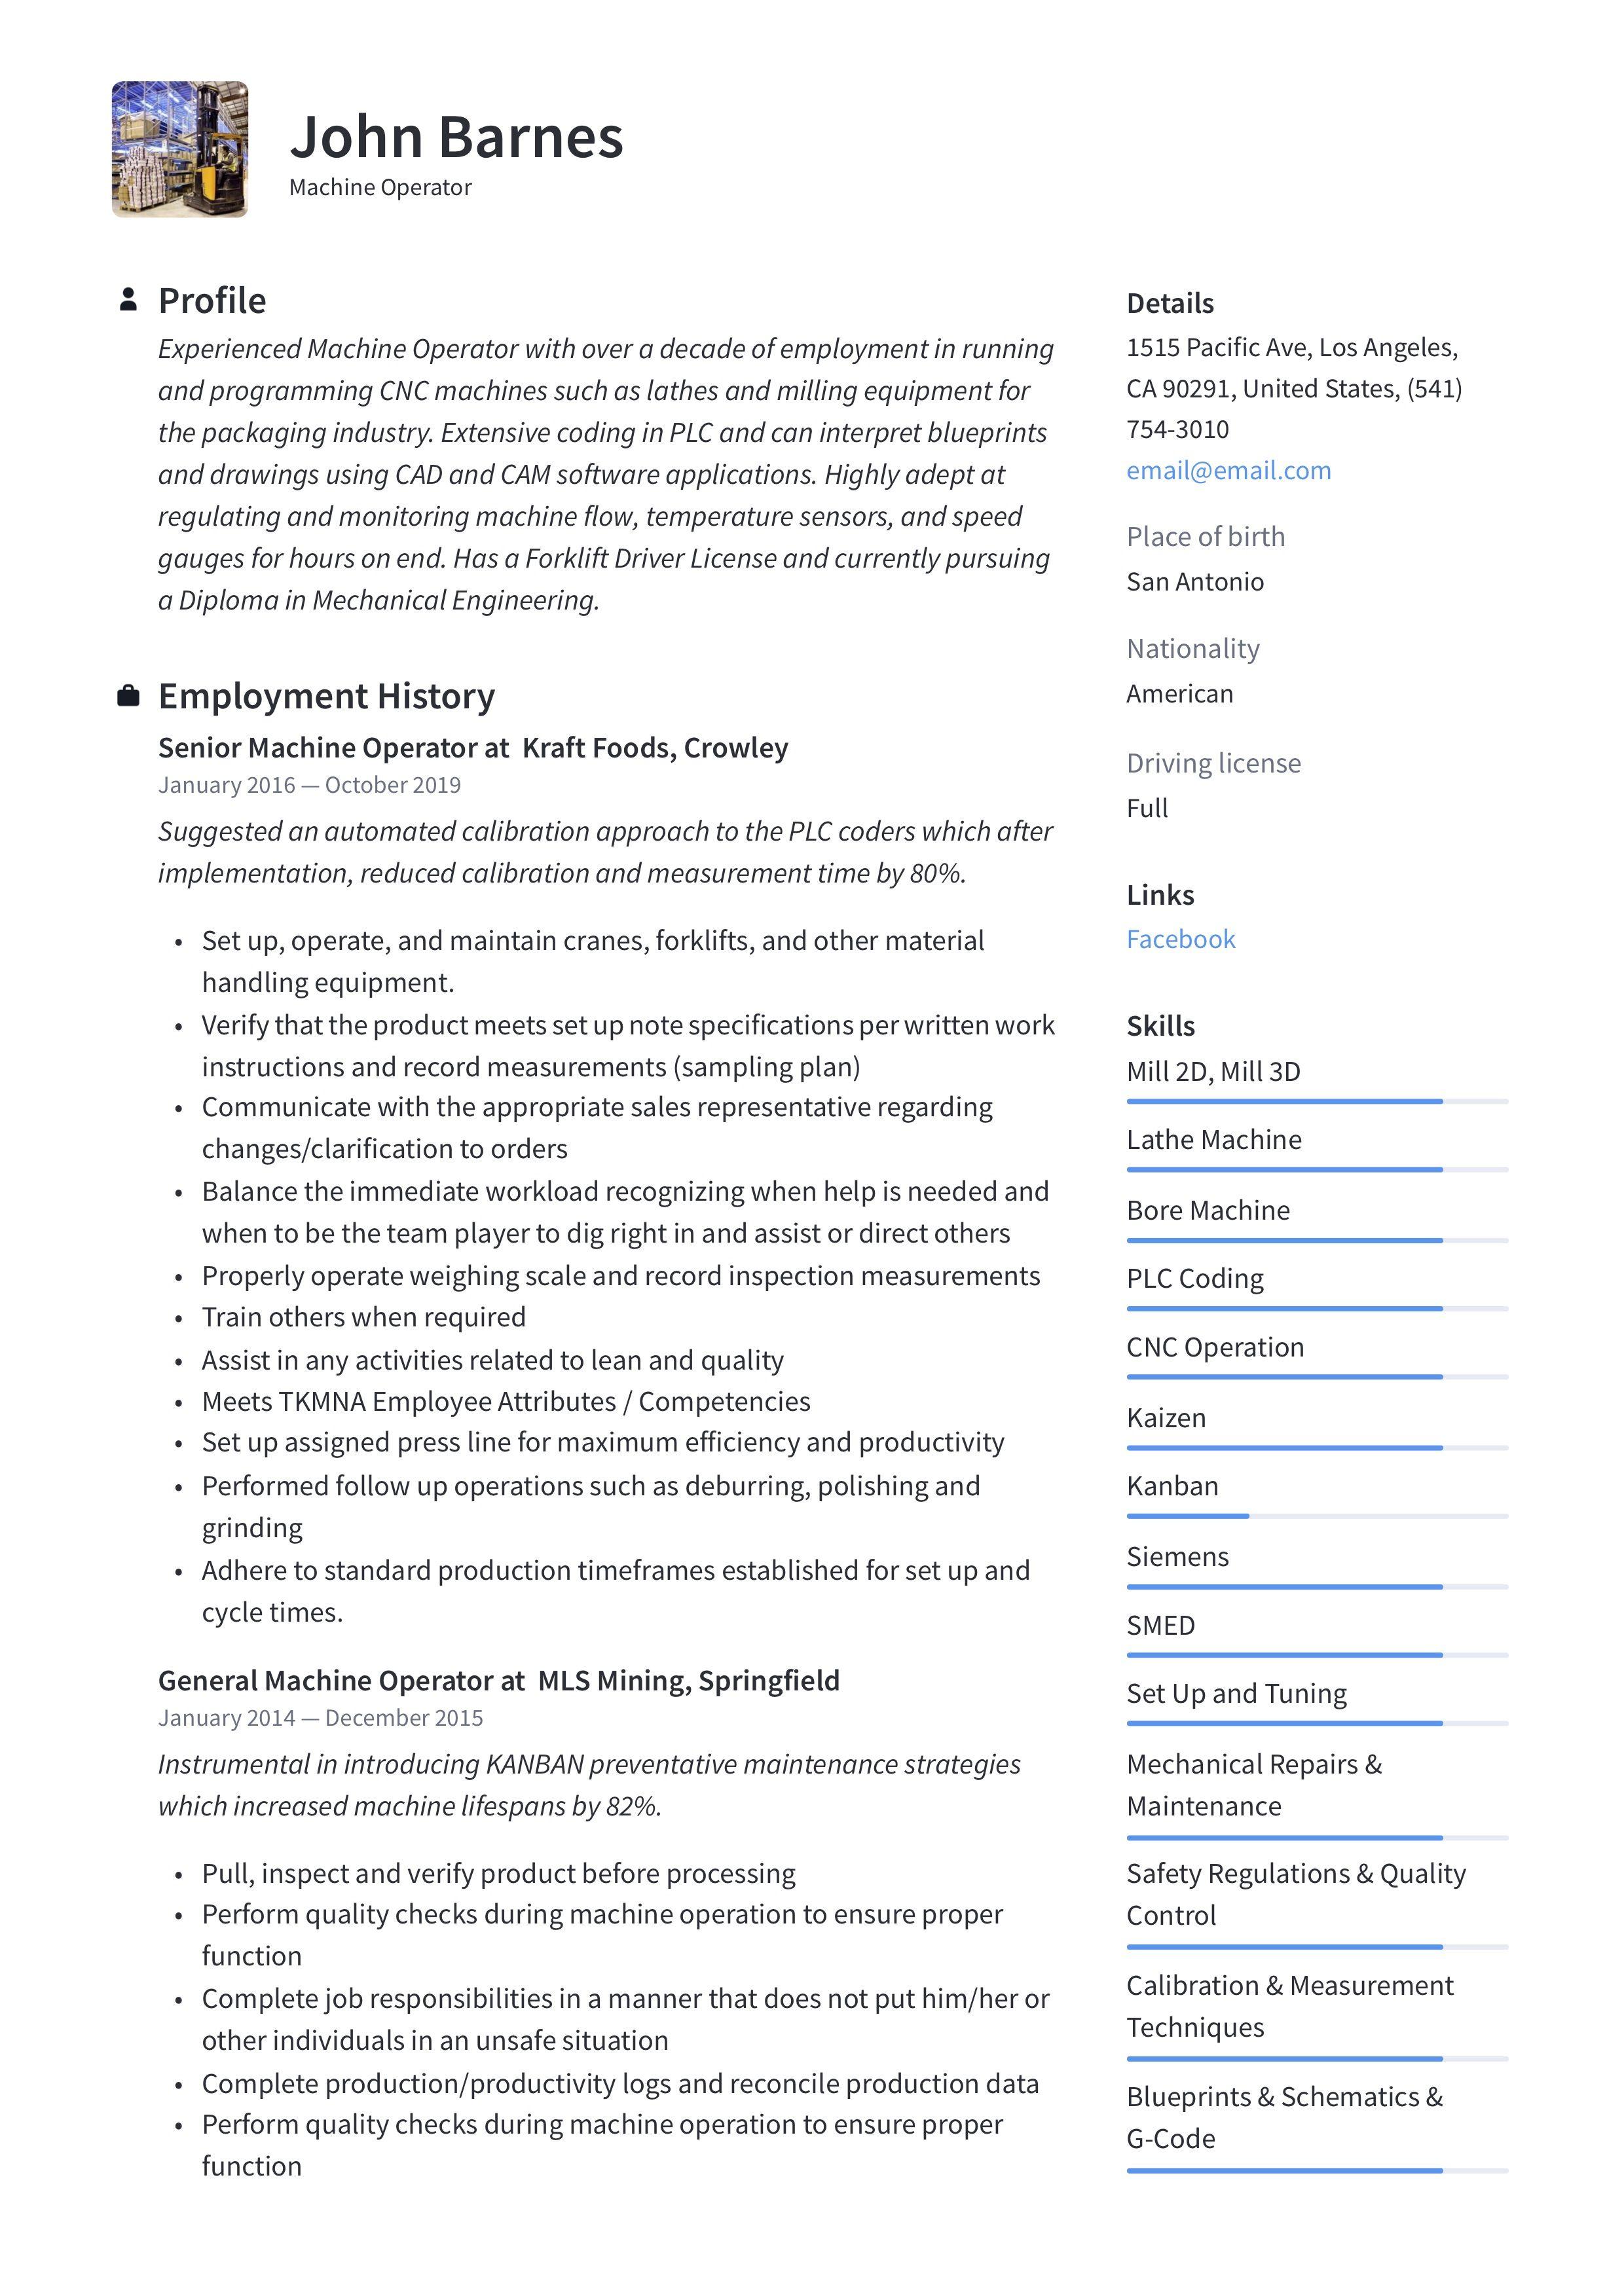 Machine Operator Resume Template Guided Writing Resume Guide Resume Template